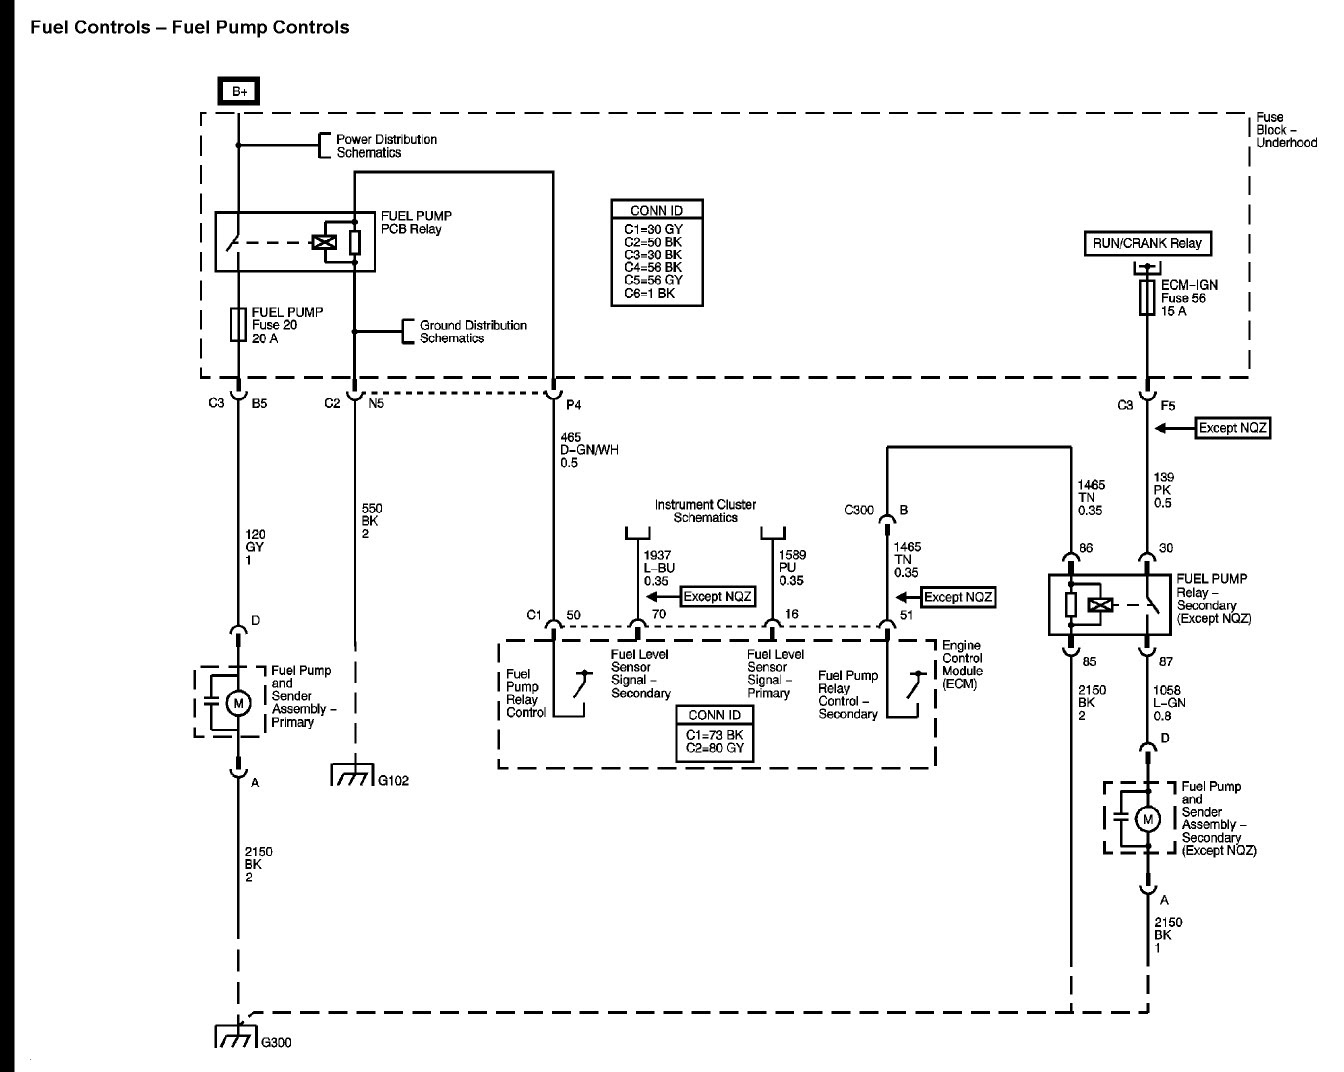 97 S10 Fuel Gauge Wiring Diagram - Wiring Diagram